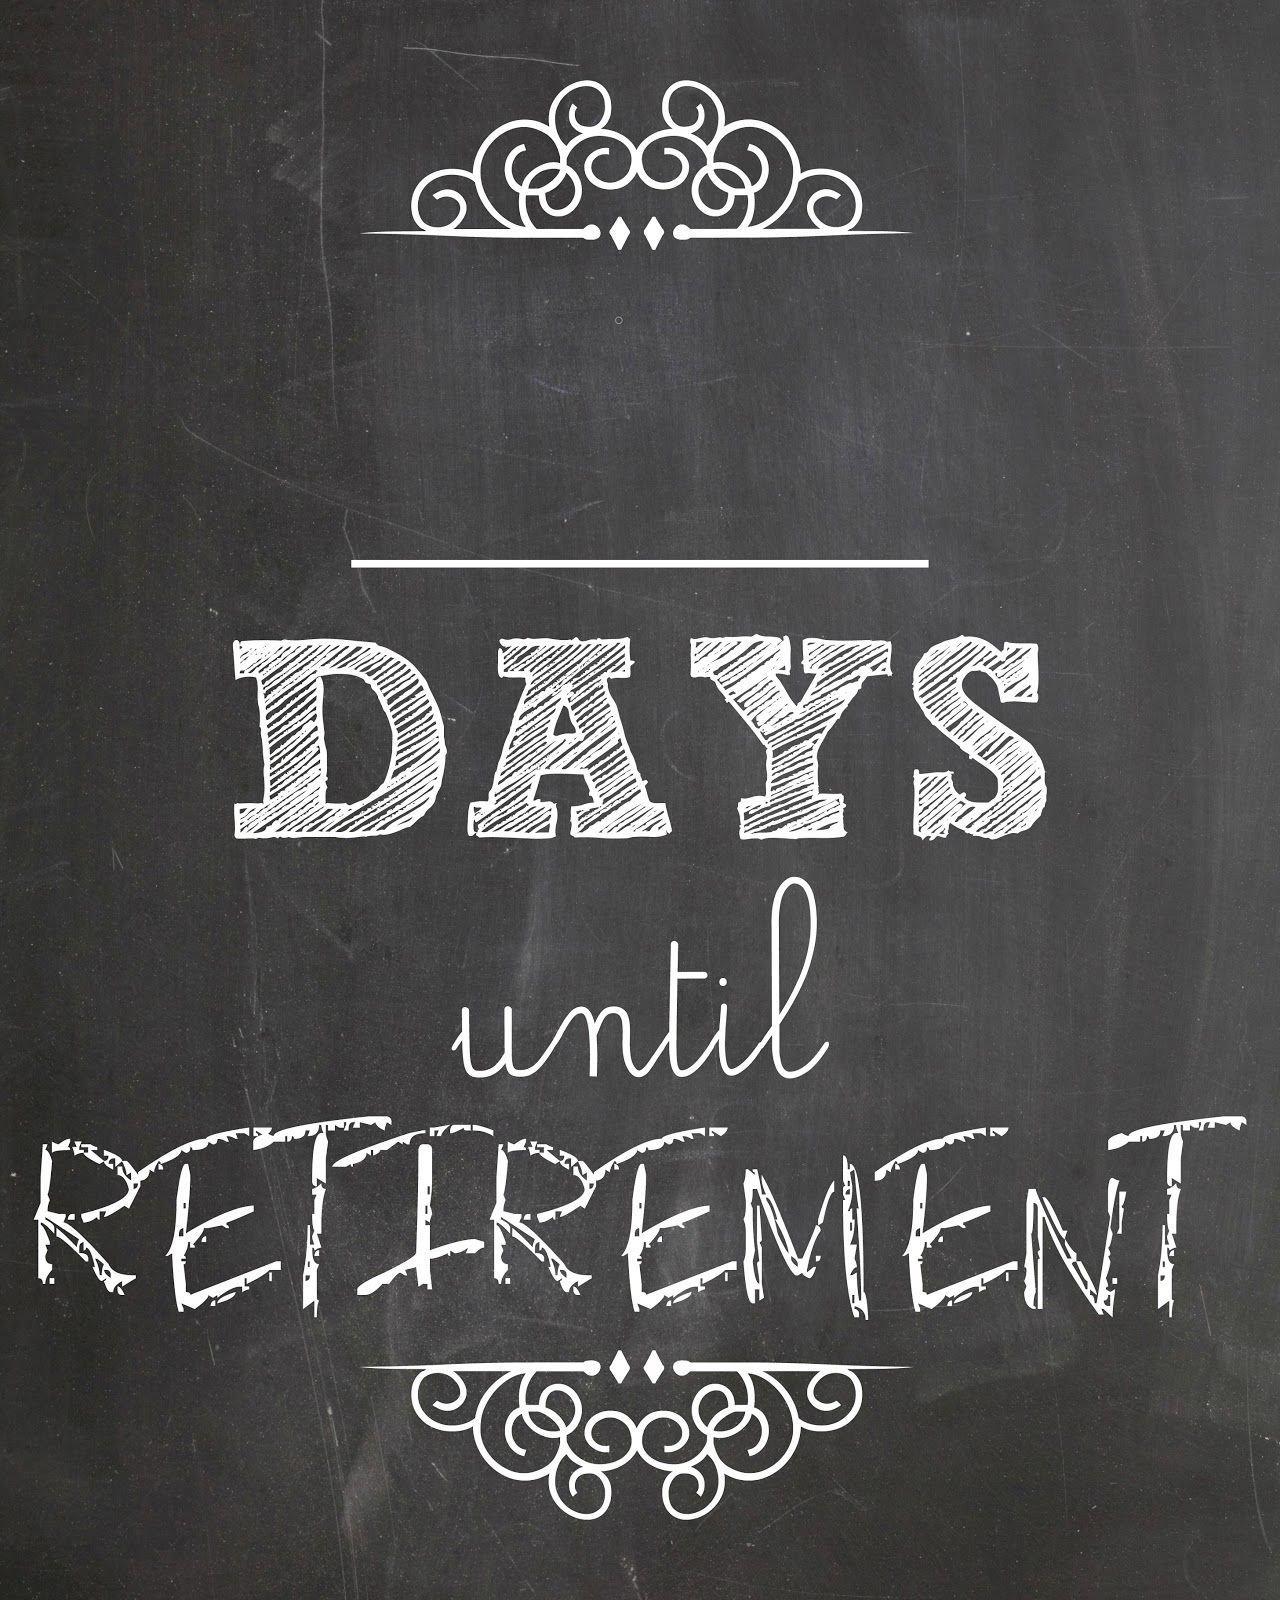 Retirement Countdown Calendar Ideas In 2020 | Retirement Retirement Countdown Calendars Printable